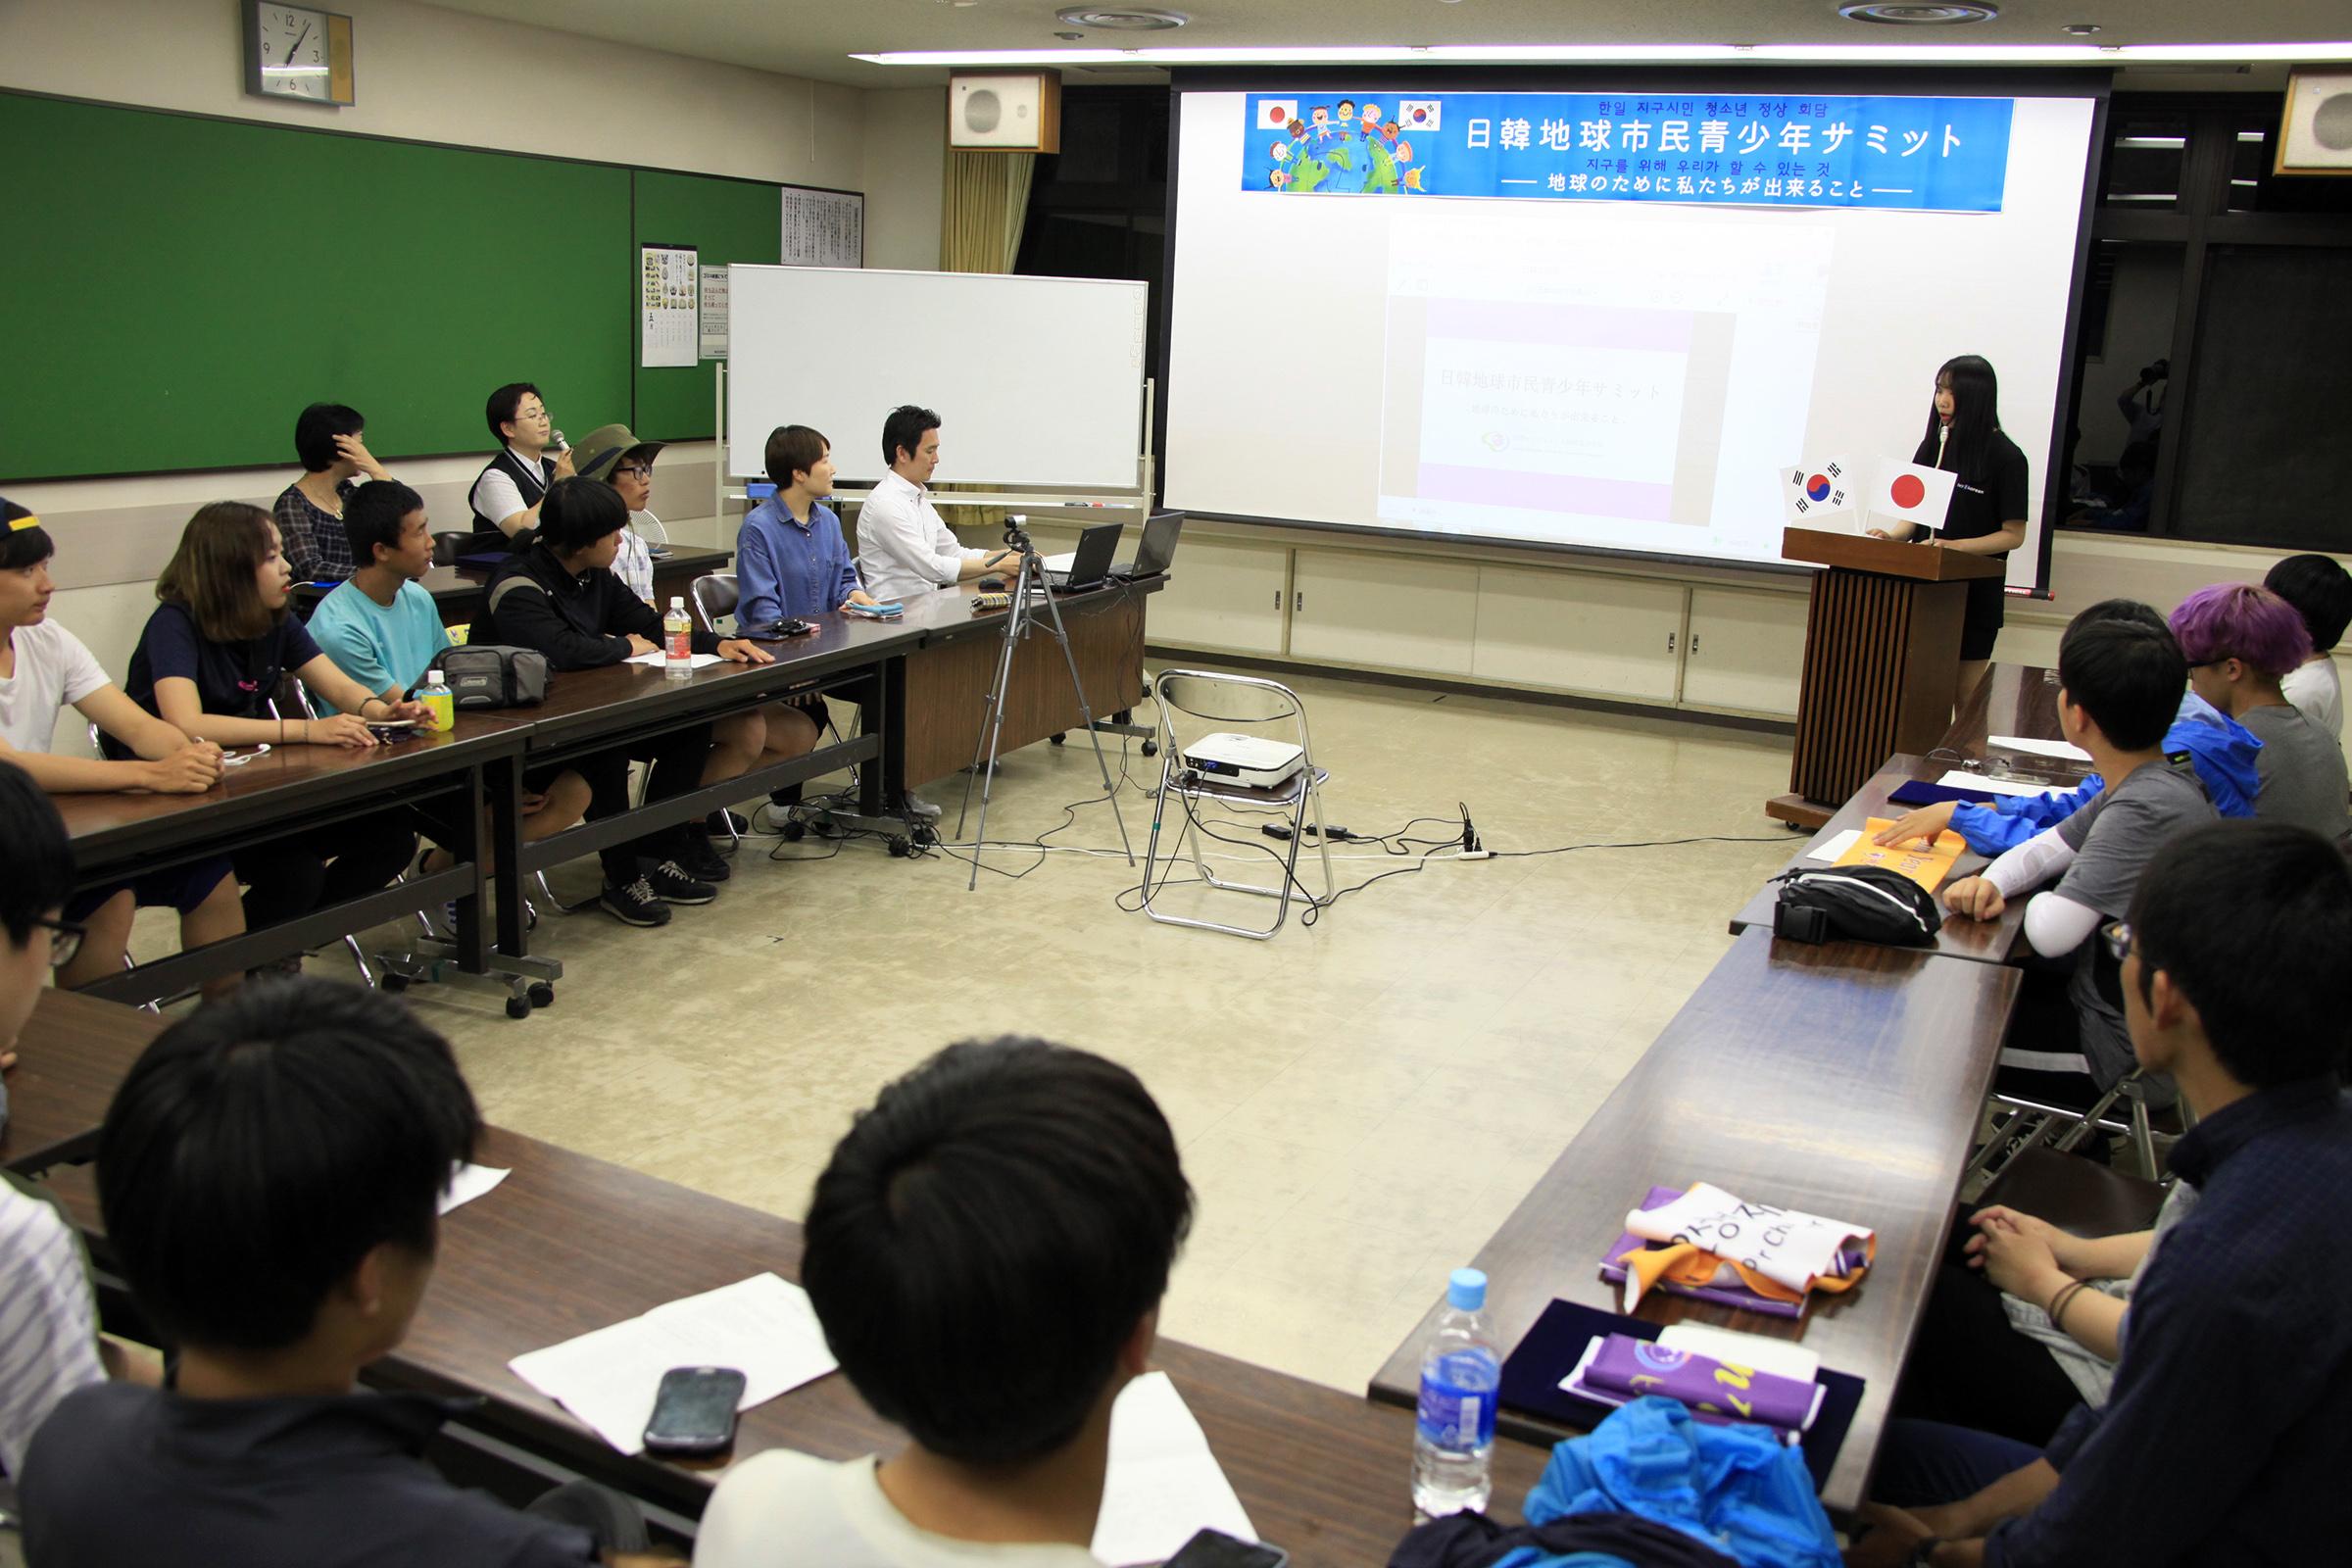 [2016 0519] JP CC 일한 지구시민 청소년 서미트 (54)